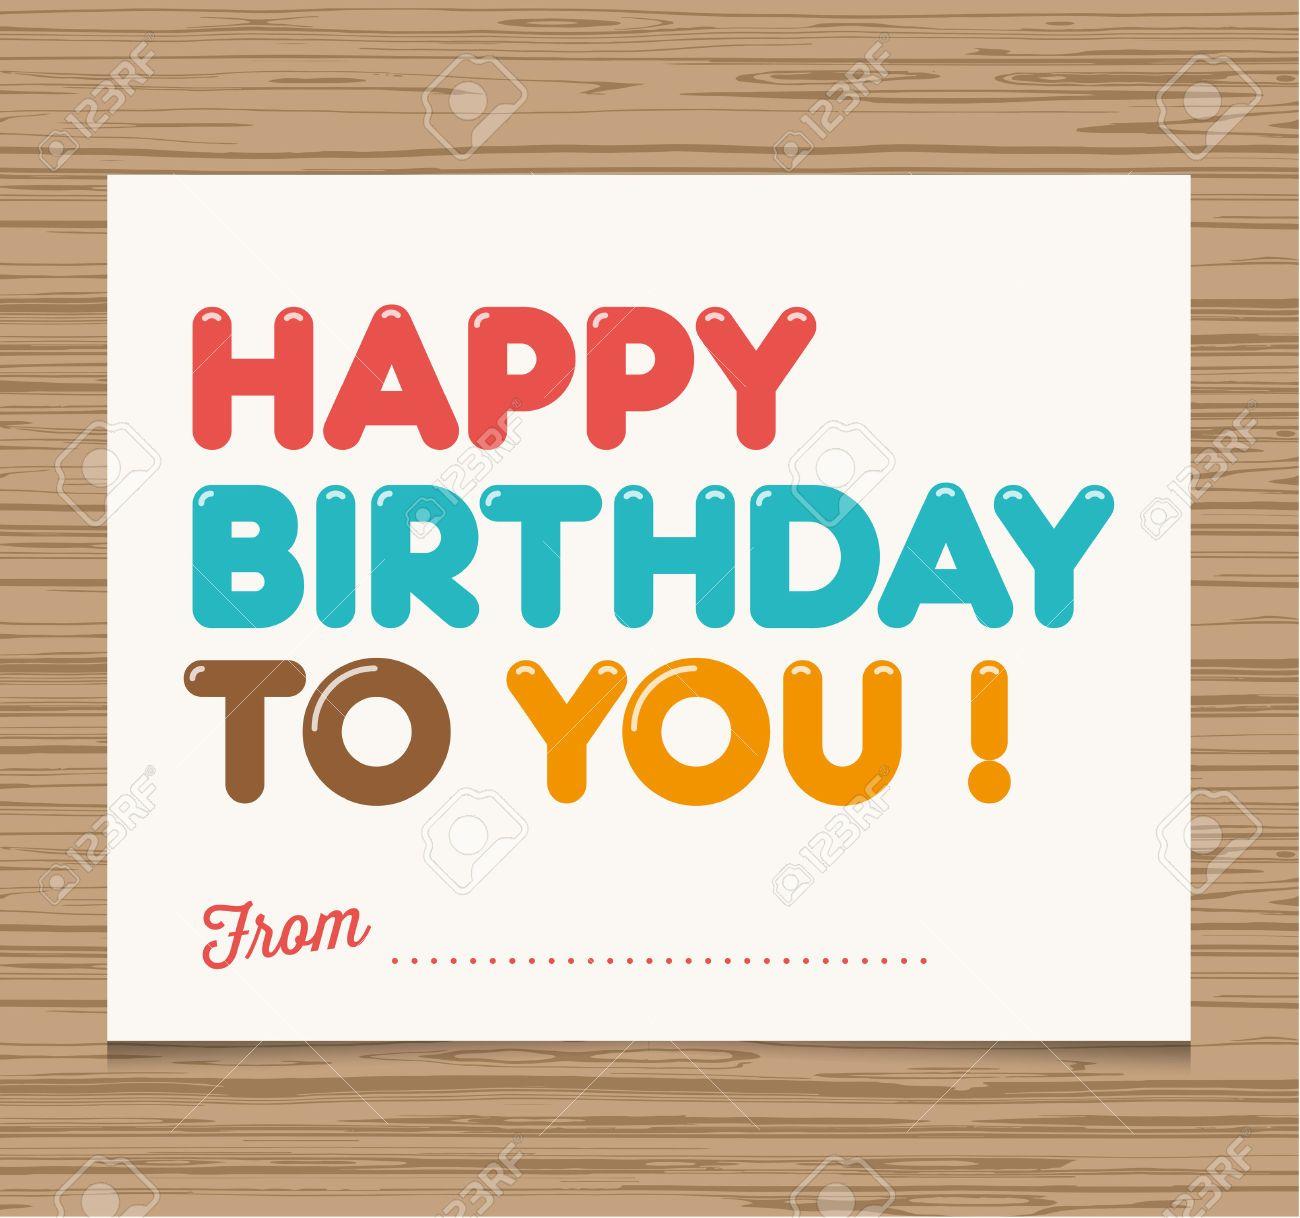 Birthday card font image collections birthday cards ideas balloon font flat google zoeken logojoeps pinterest fonts balloon font flat google zoeken hand typehappy birthday bookmarktalkfo Choice Image